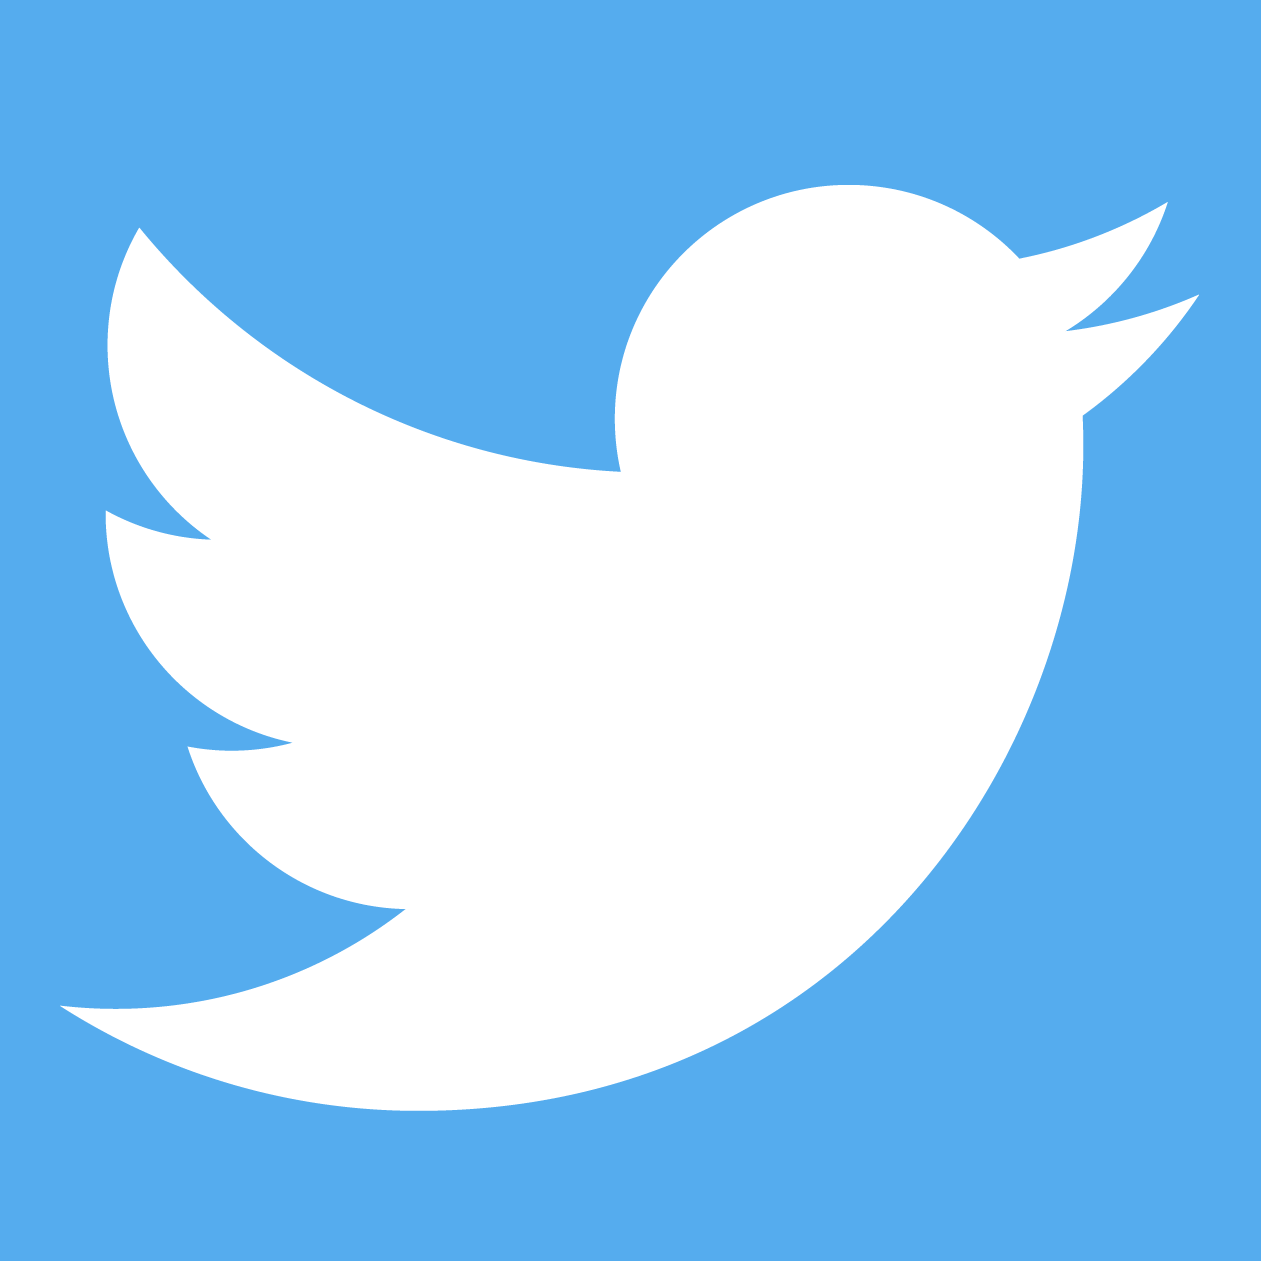 Twitter official Logos